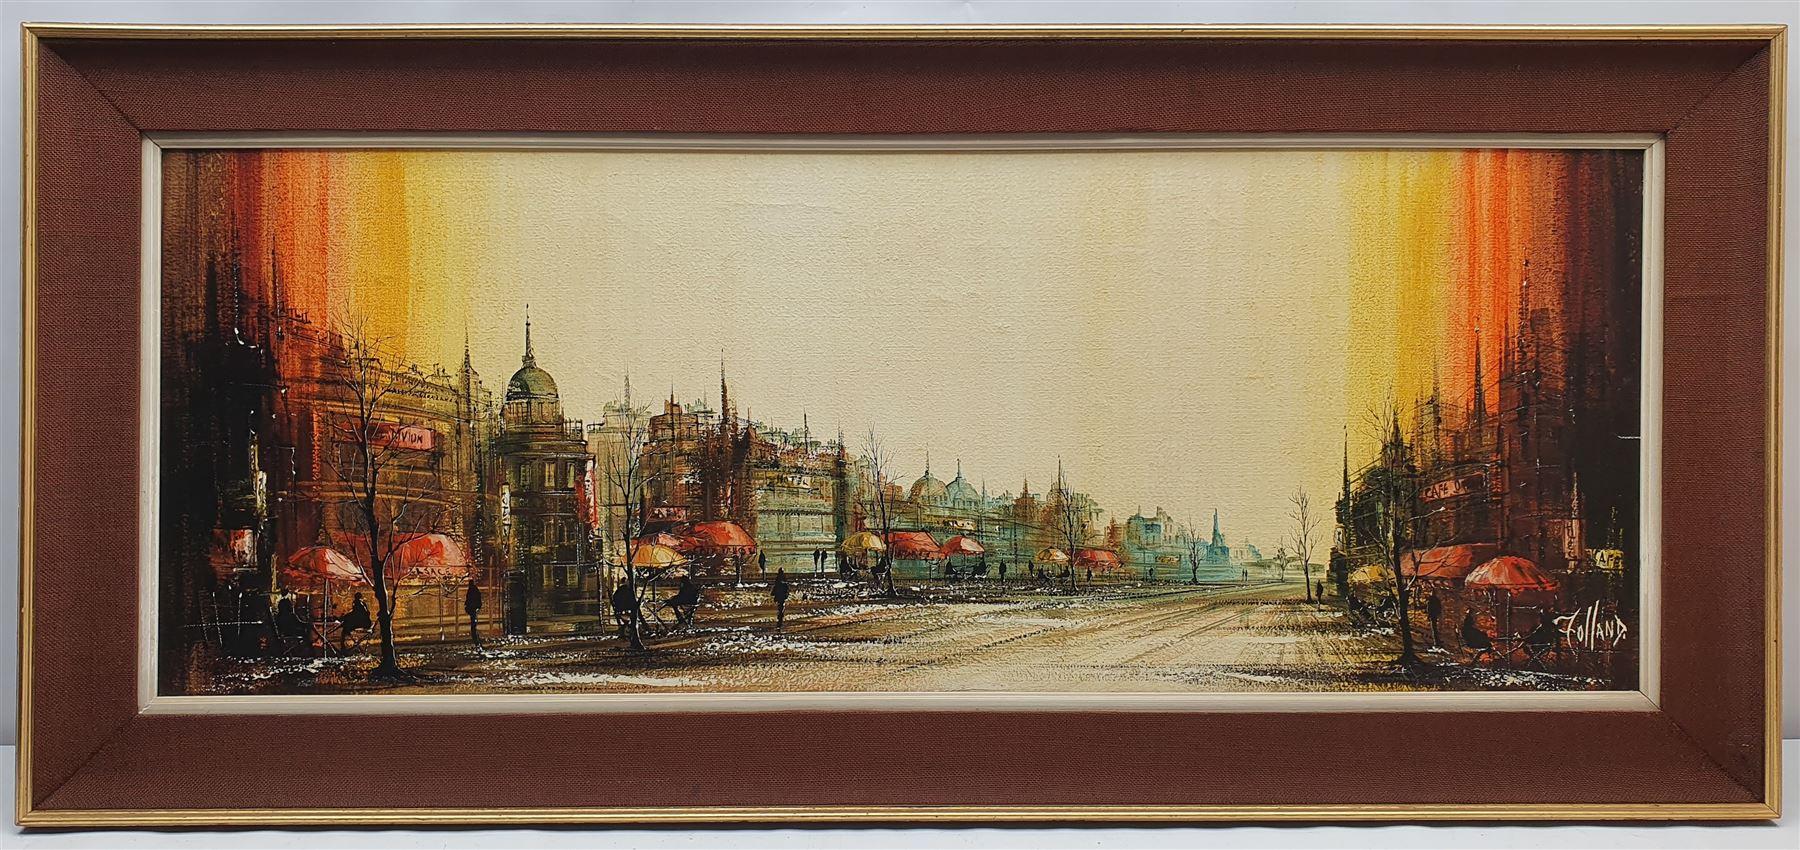 Ronald Norman Folland (British 1932-1999): Parisian Street - Image 2 of 2